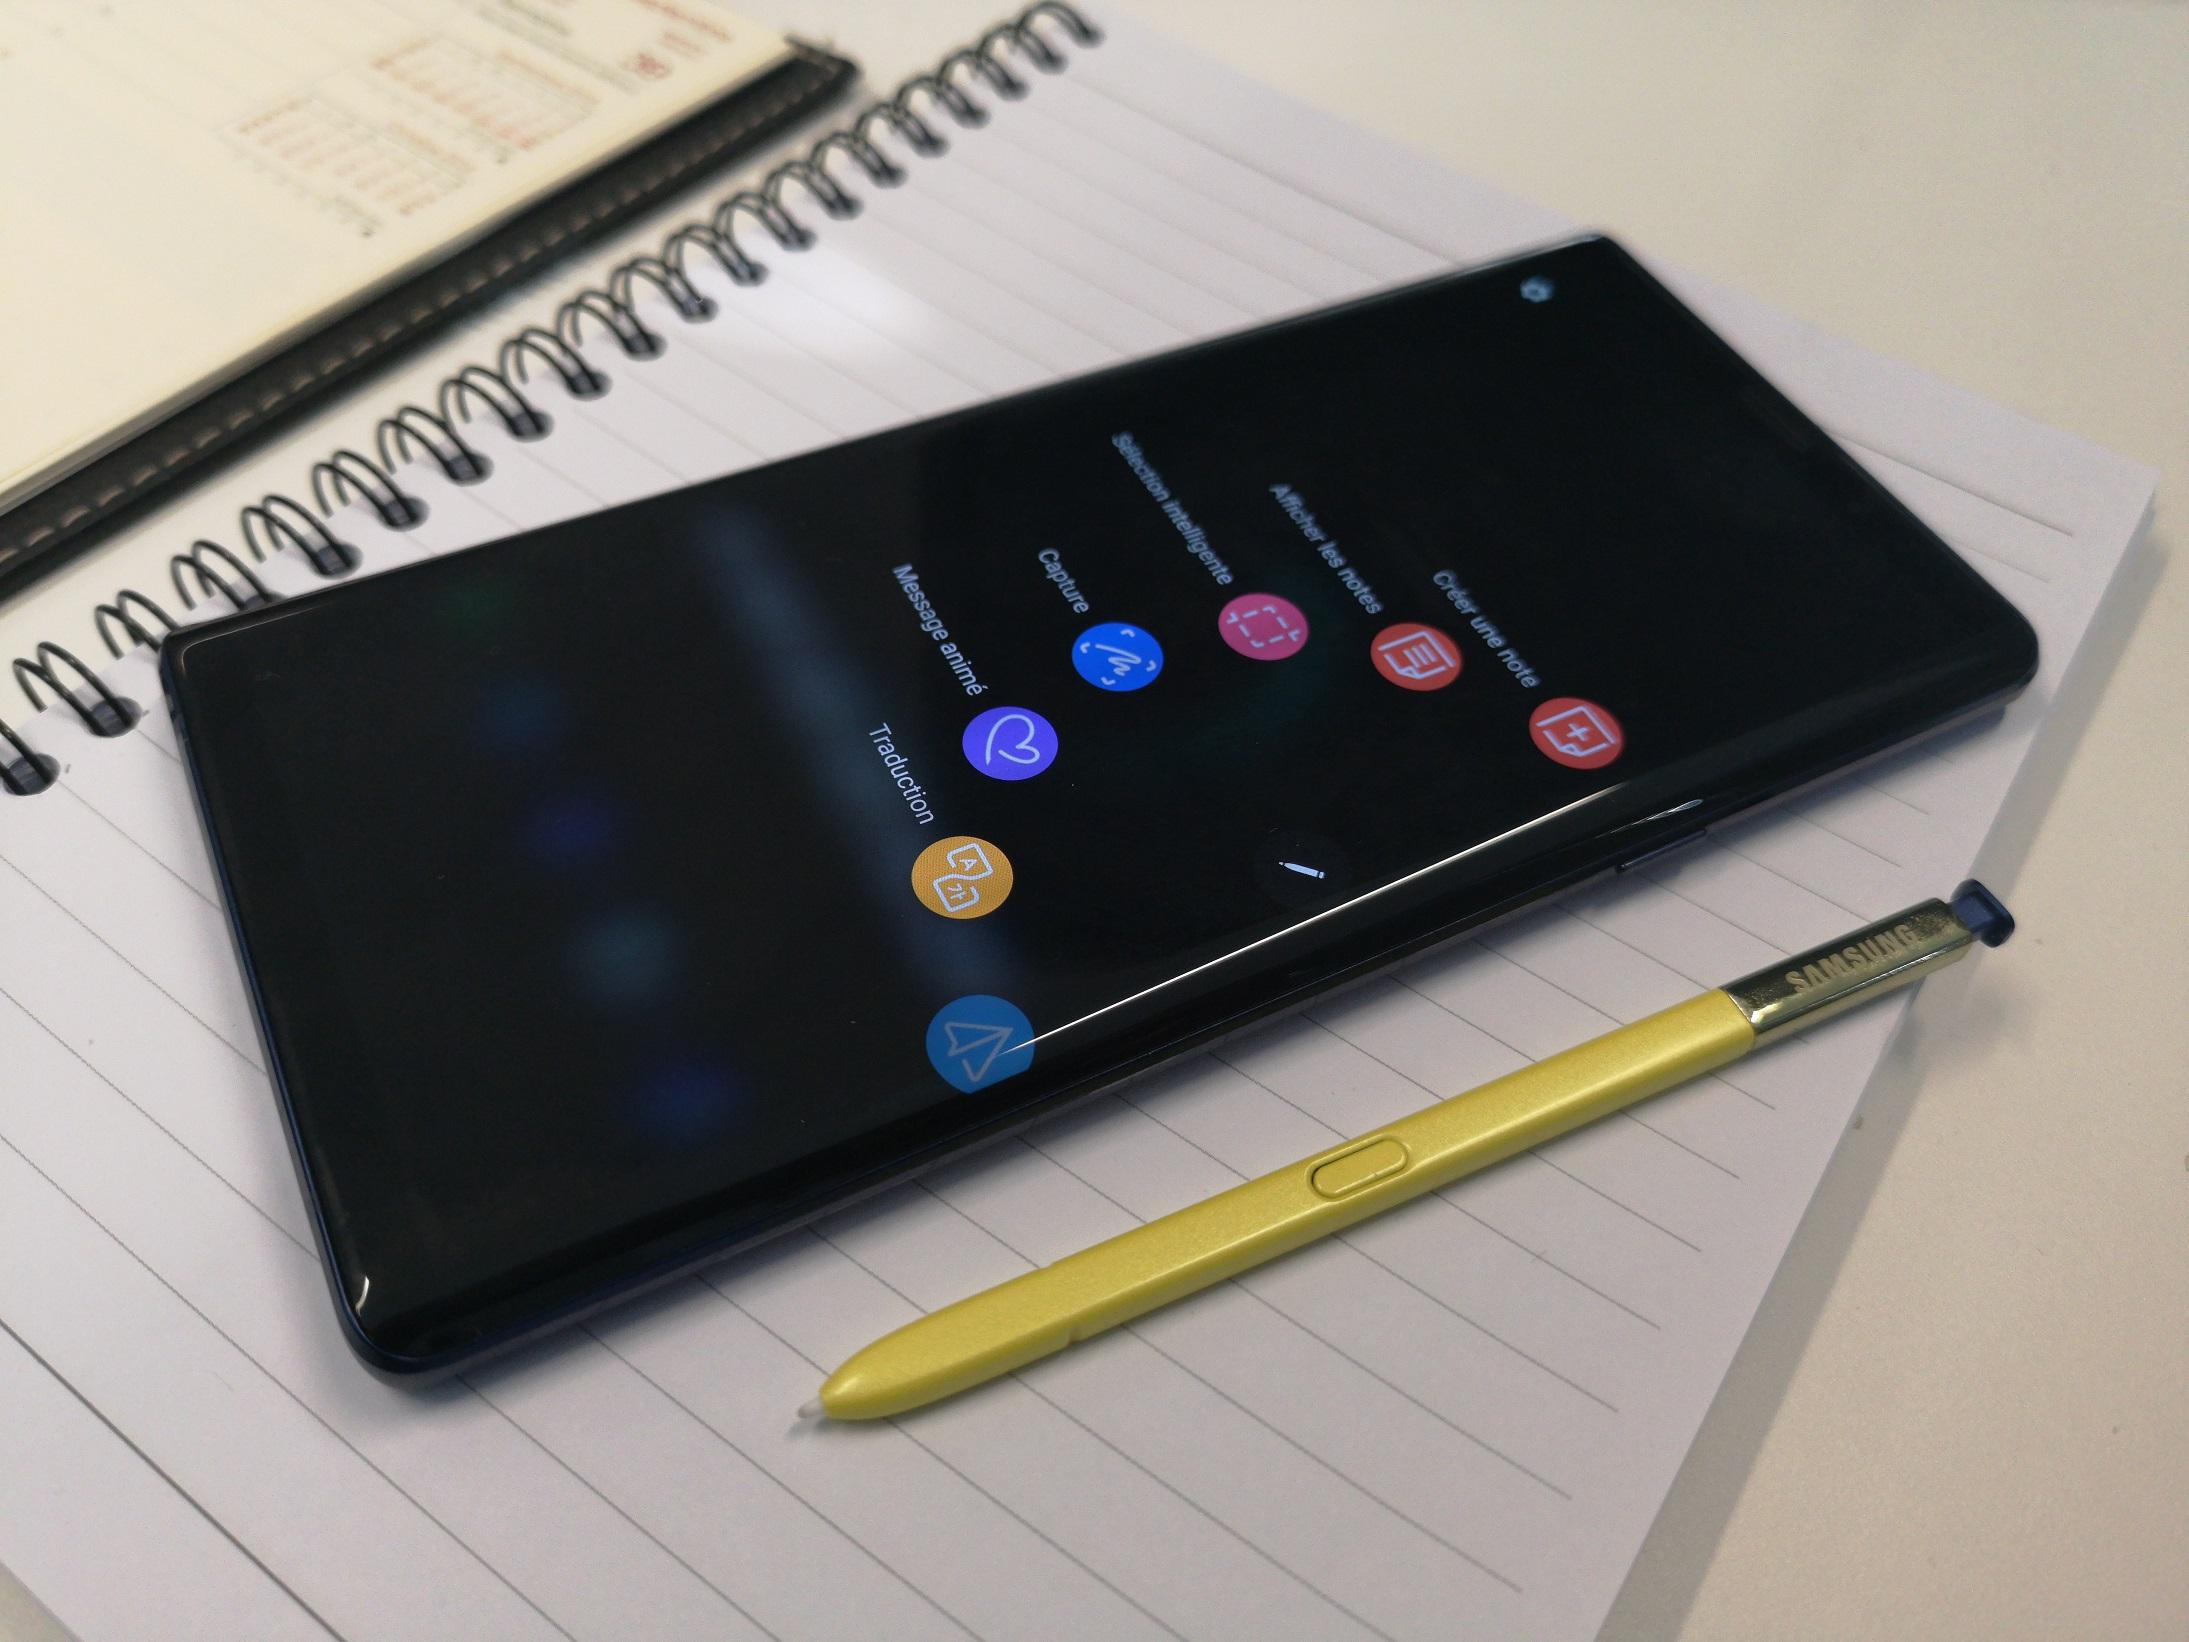 Bon plan : Samsung Galaxy Note 9 à 639 euros sur Rakuten !